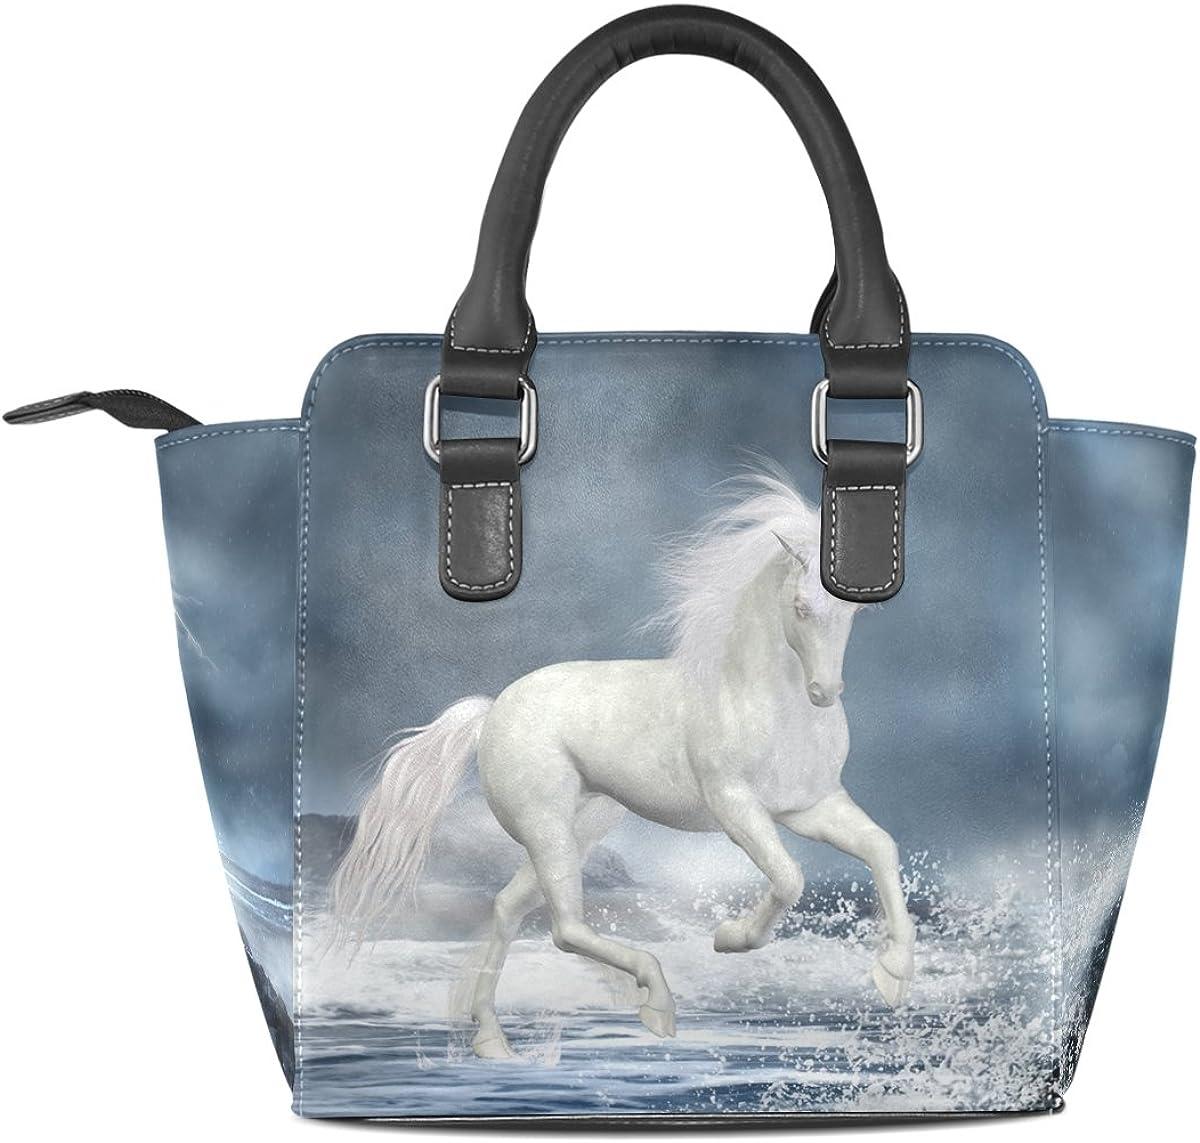 Jennifer PU Leather Top-Handle Handbags White Unicorn Running Over Sea Single-Shoulder Tote Crossbody Bag Messenger Bags For Women